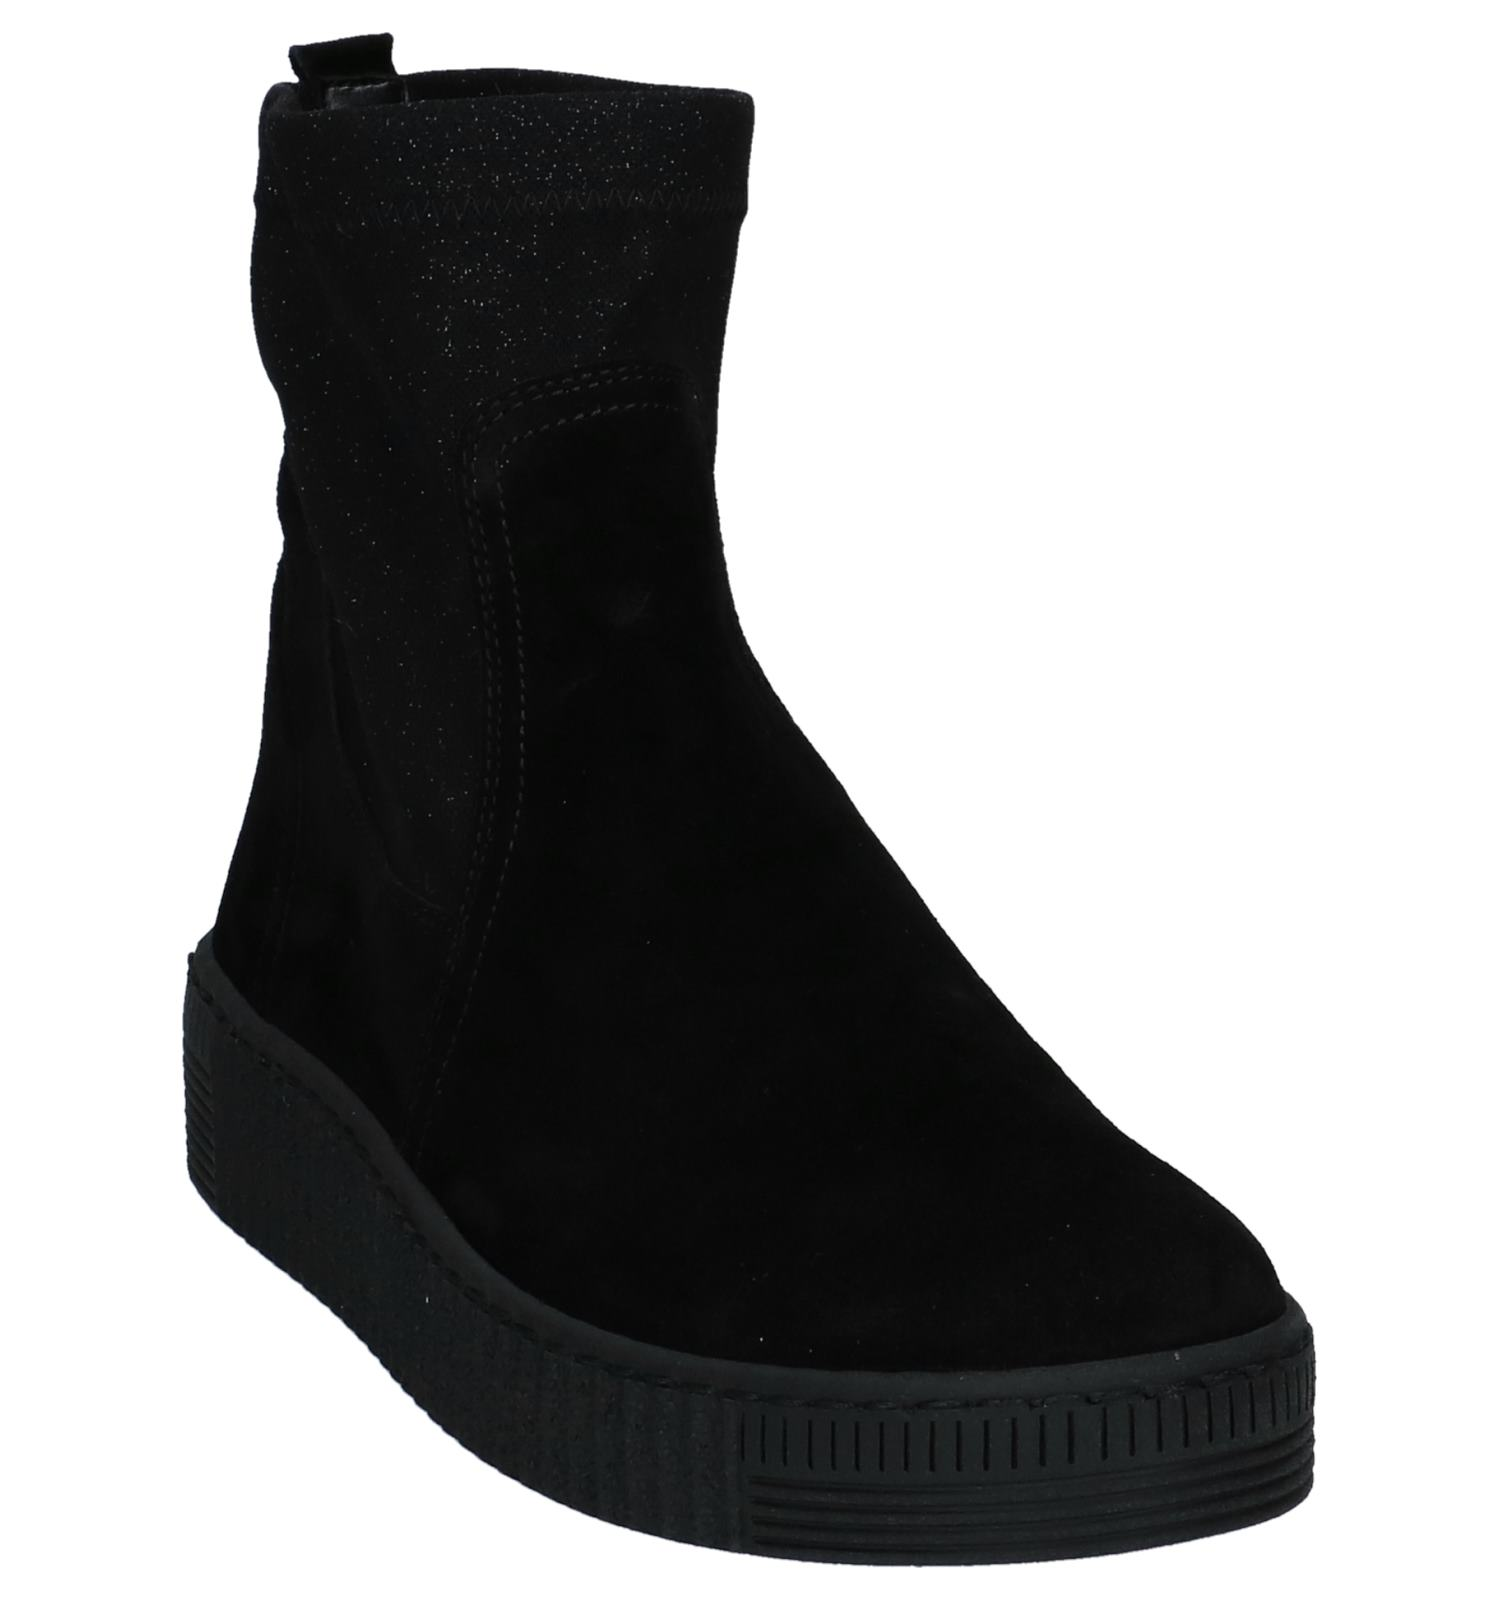 Glitter Met Zwarte Gabor Geklede Fitting Boots Best vyNnP8Om0w